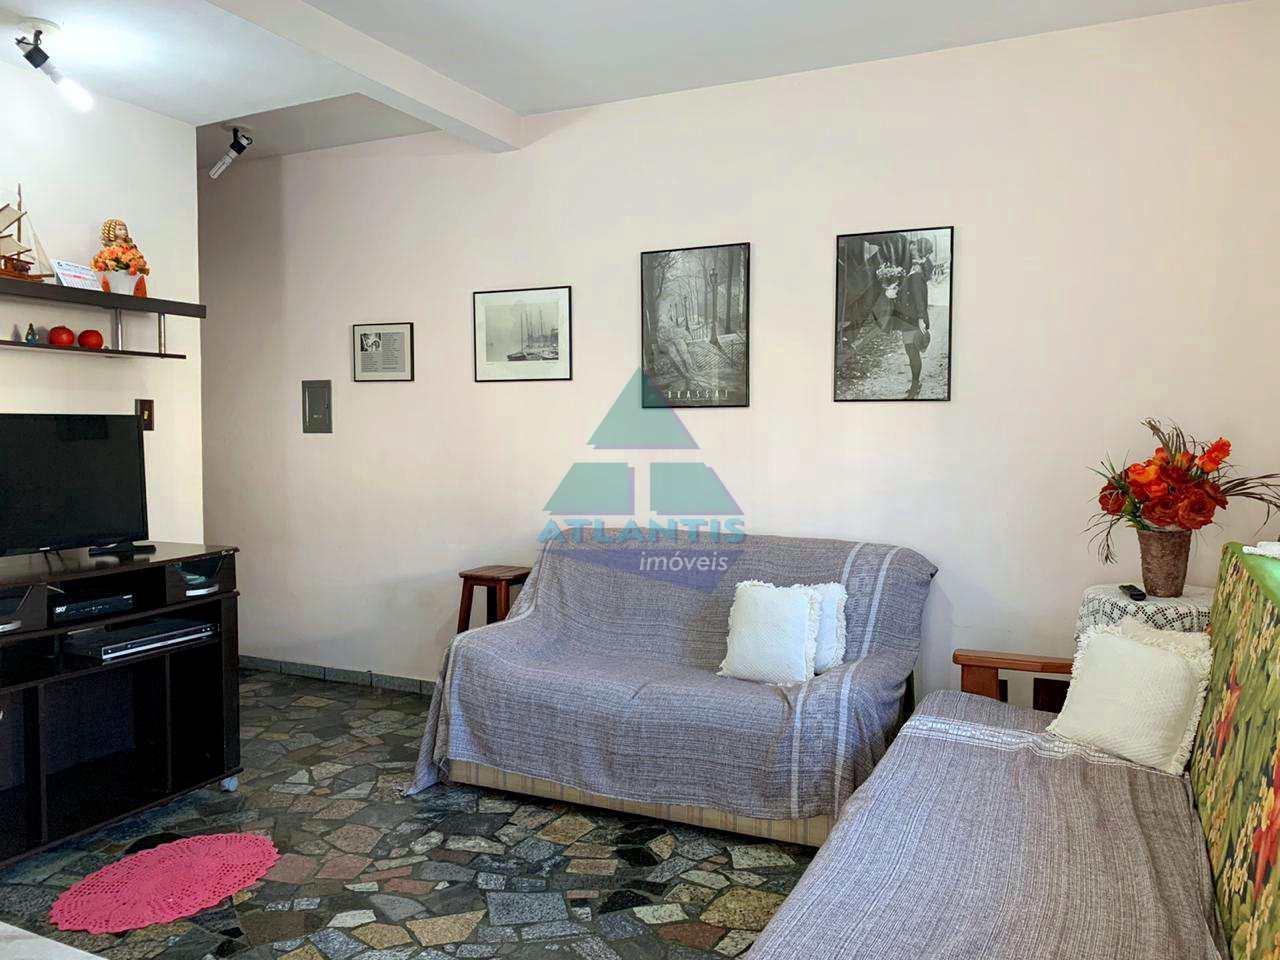 Casa de Condomínio com 2 dorms, Praia da Maranduba, Ubatuba - R$ 450 mil, Cod: 1322